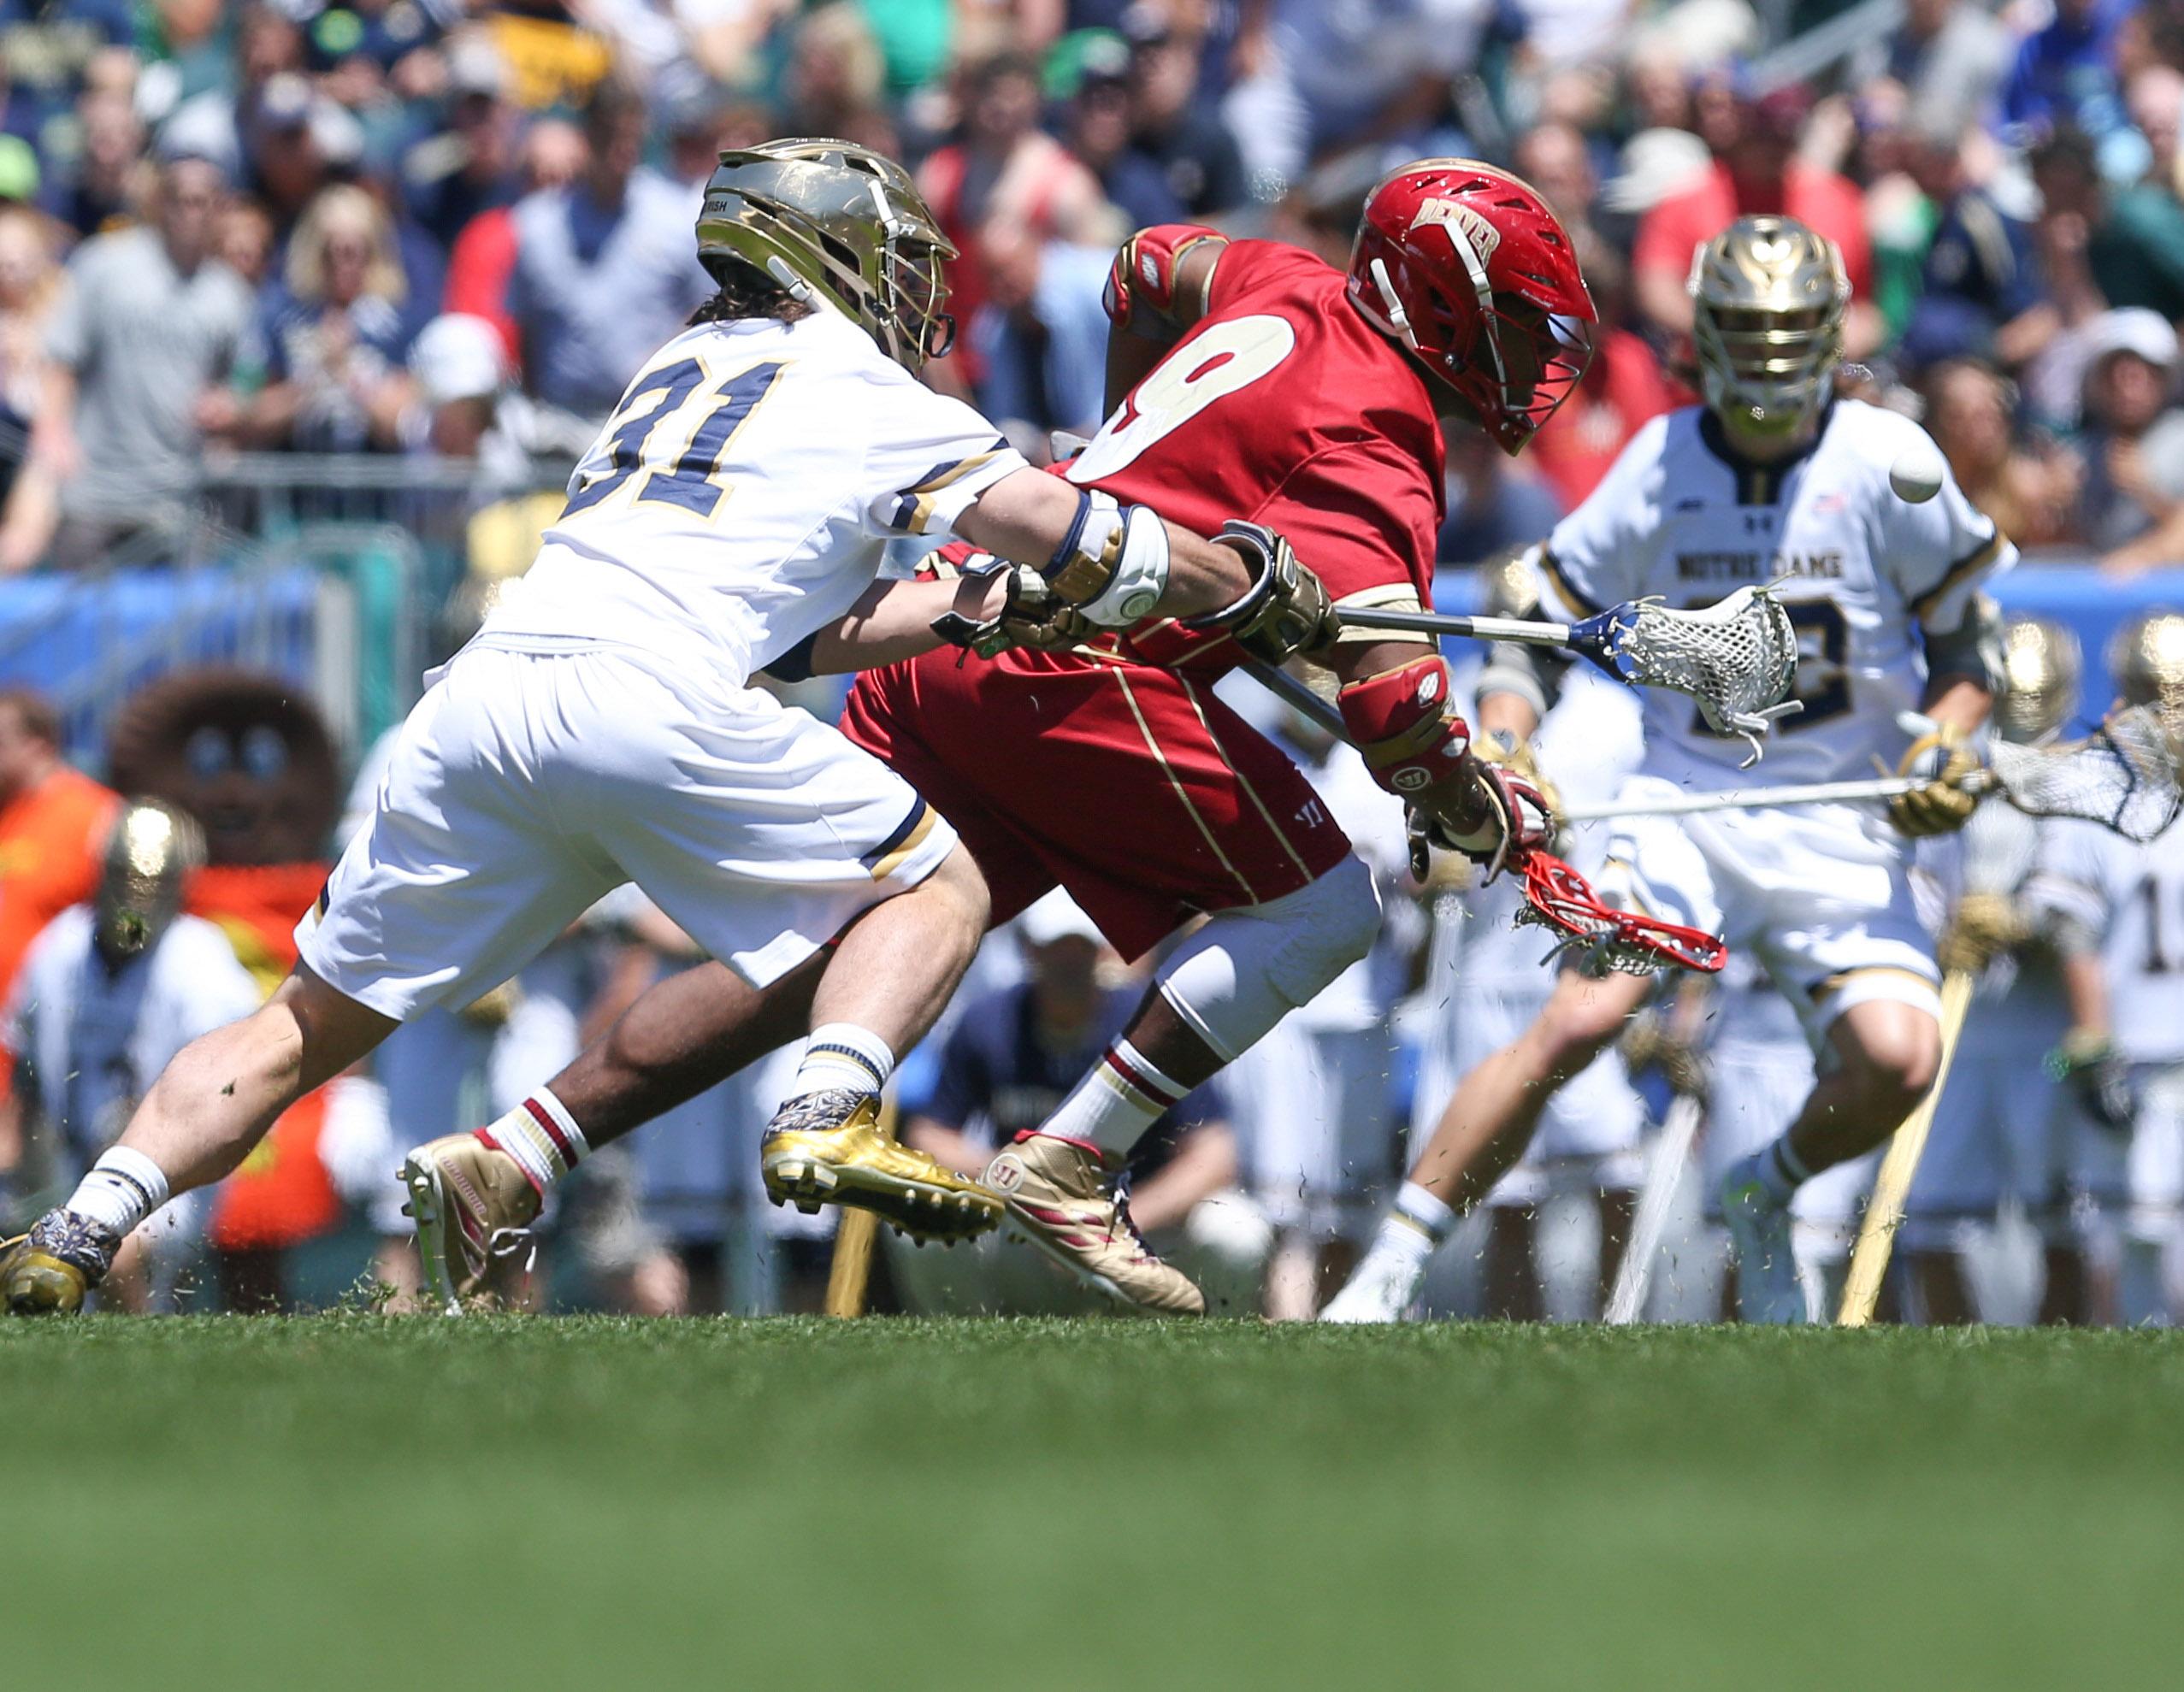 8577122-ncaa-lacrosse-semifinals-denver-pioneers-vs.-notre-dame-fighting-irish